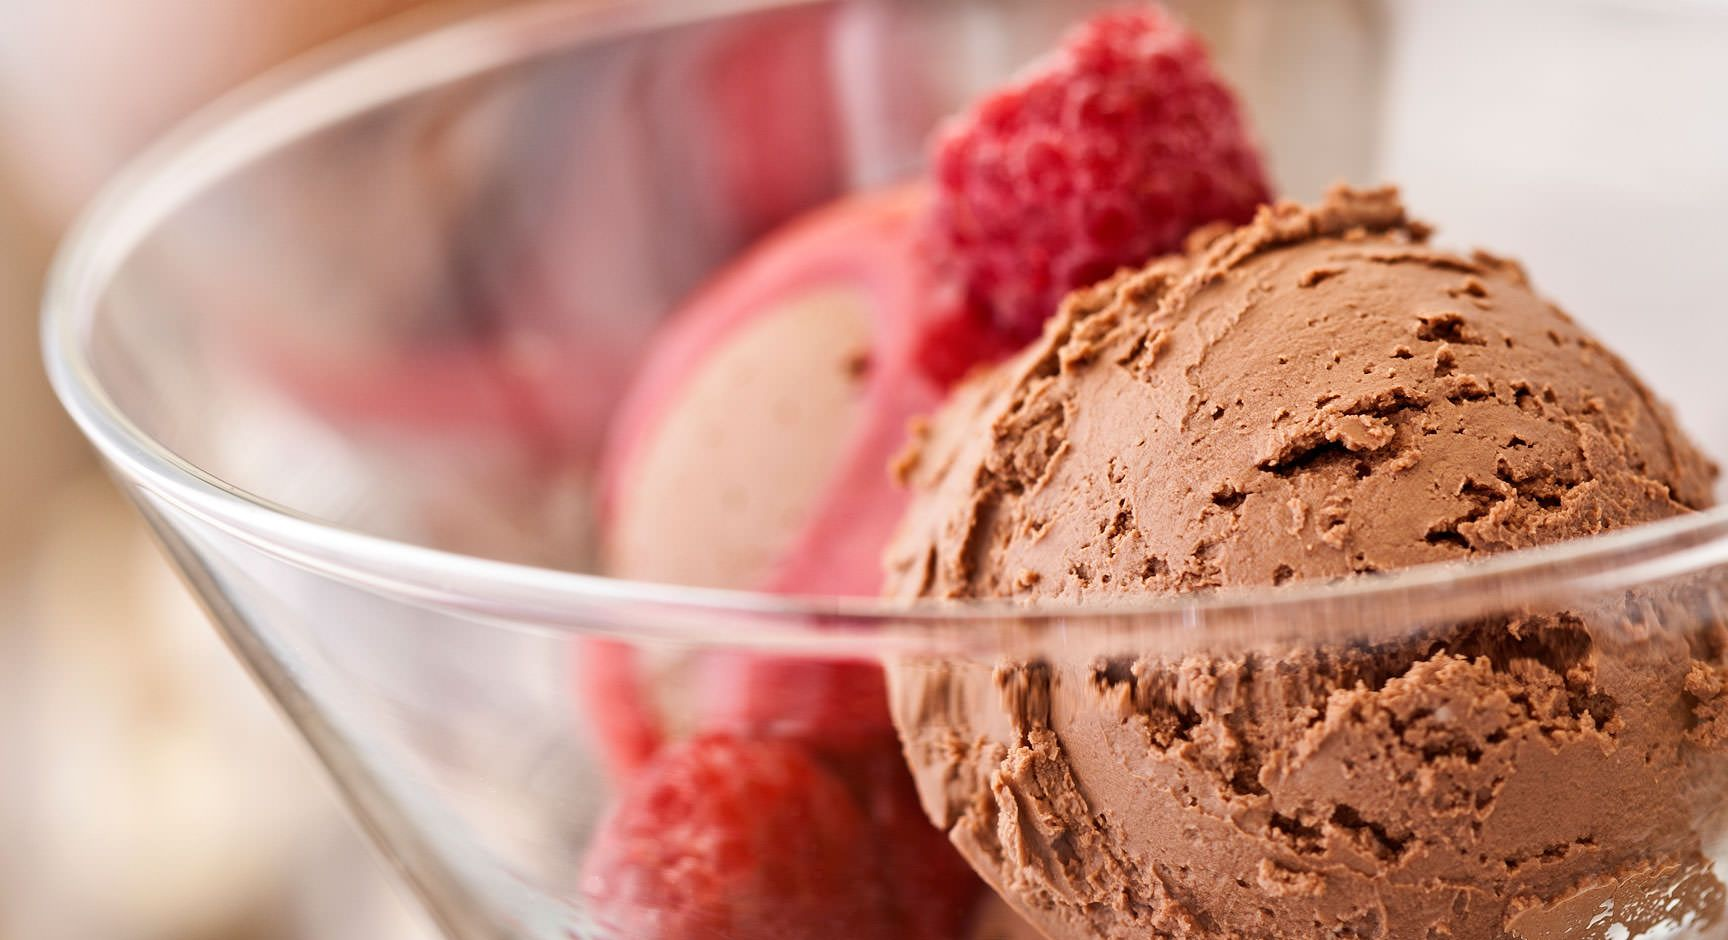 Crème glacée vegan au chocolat Crème glacée, Crème